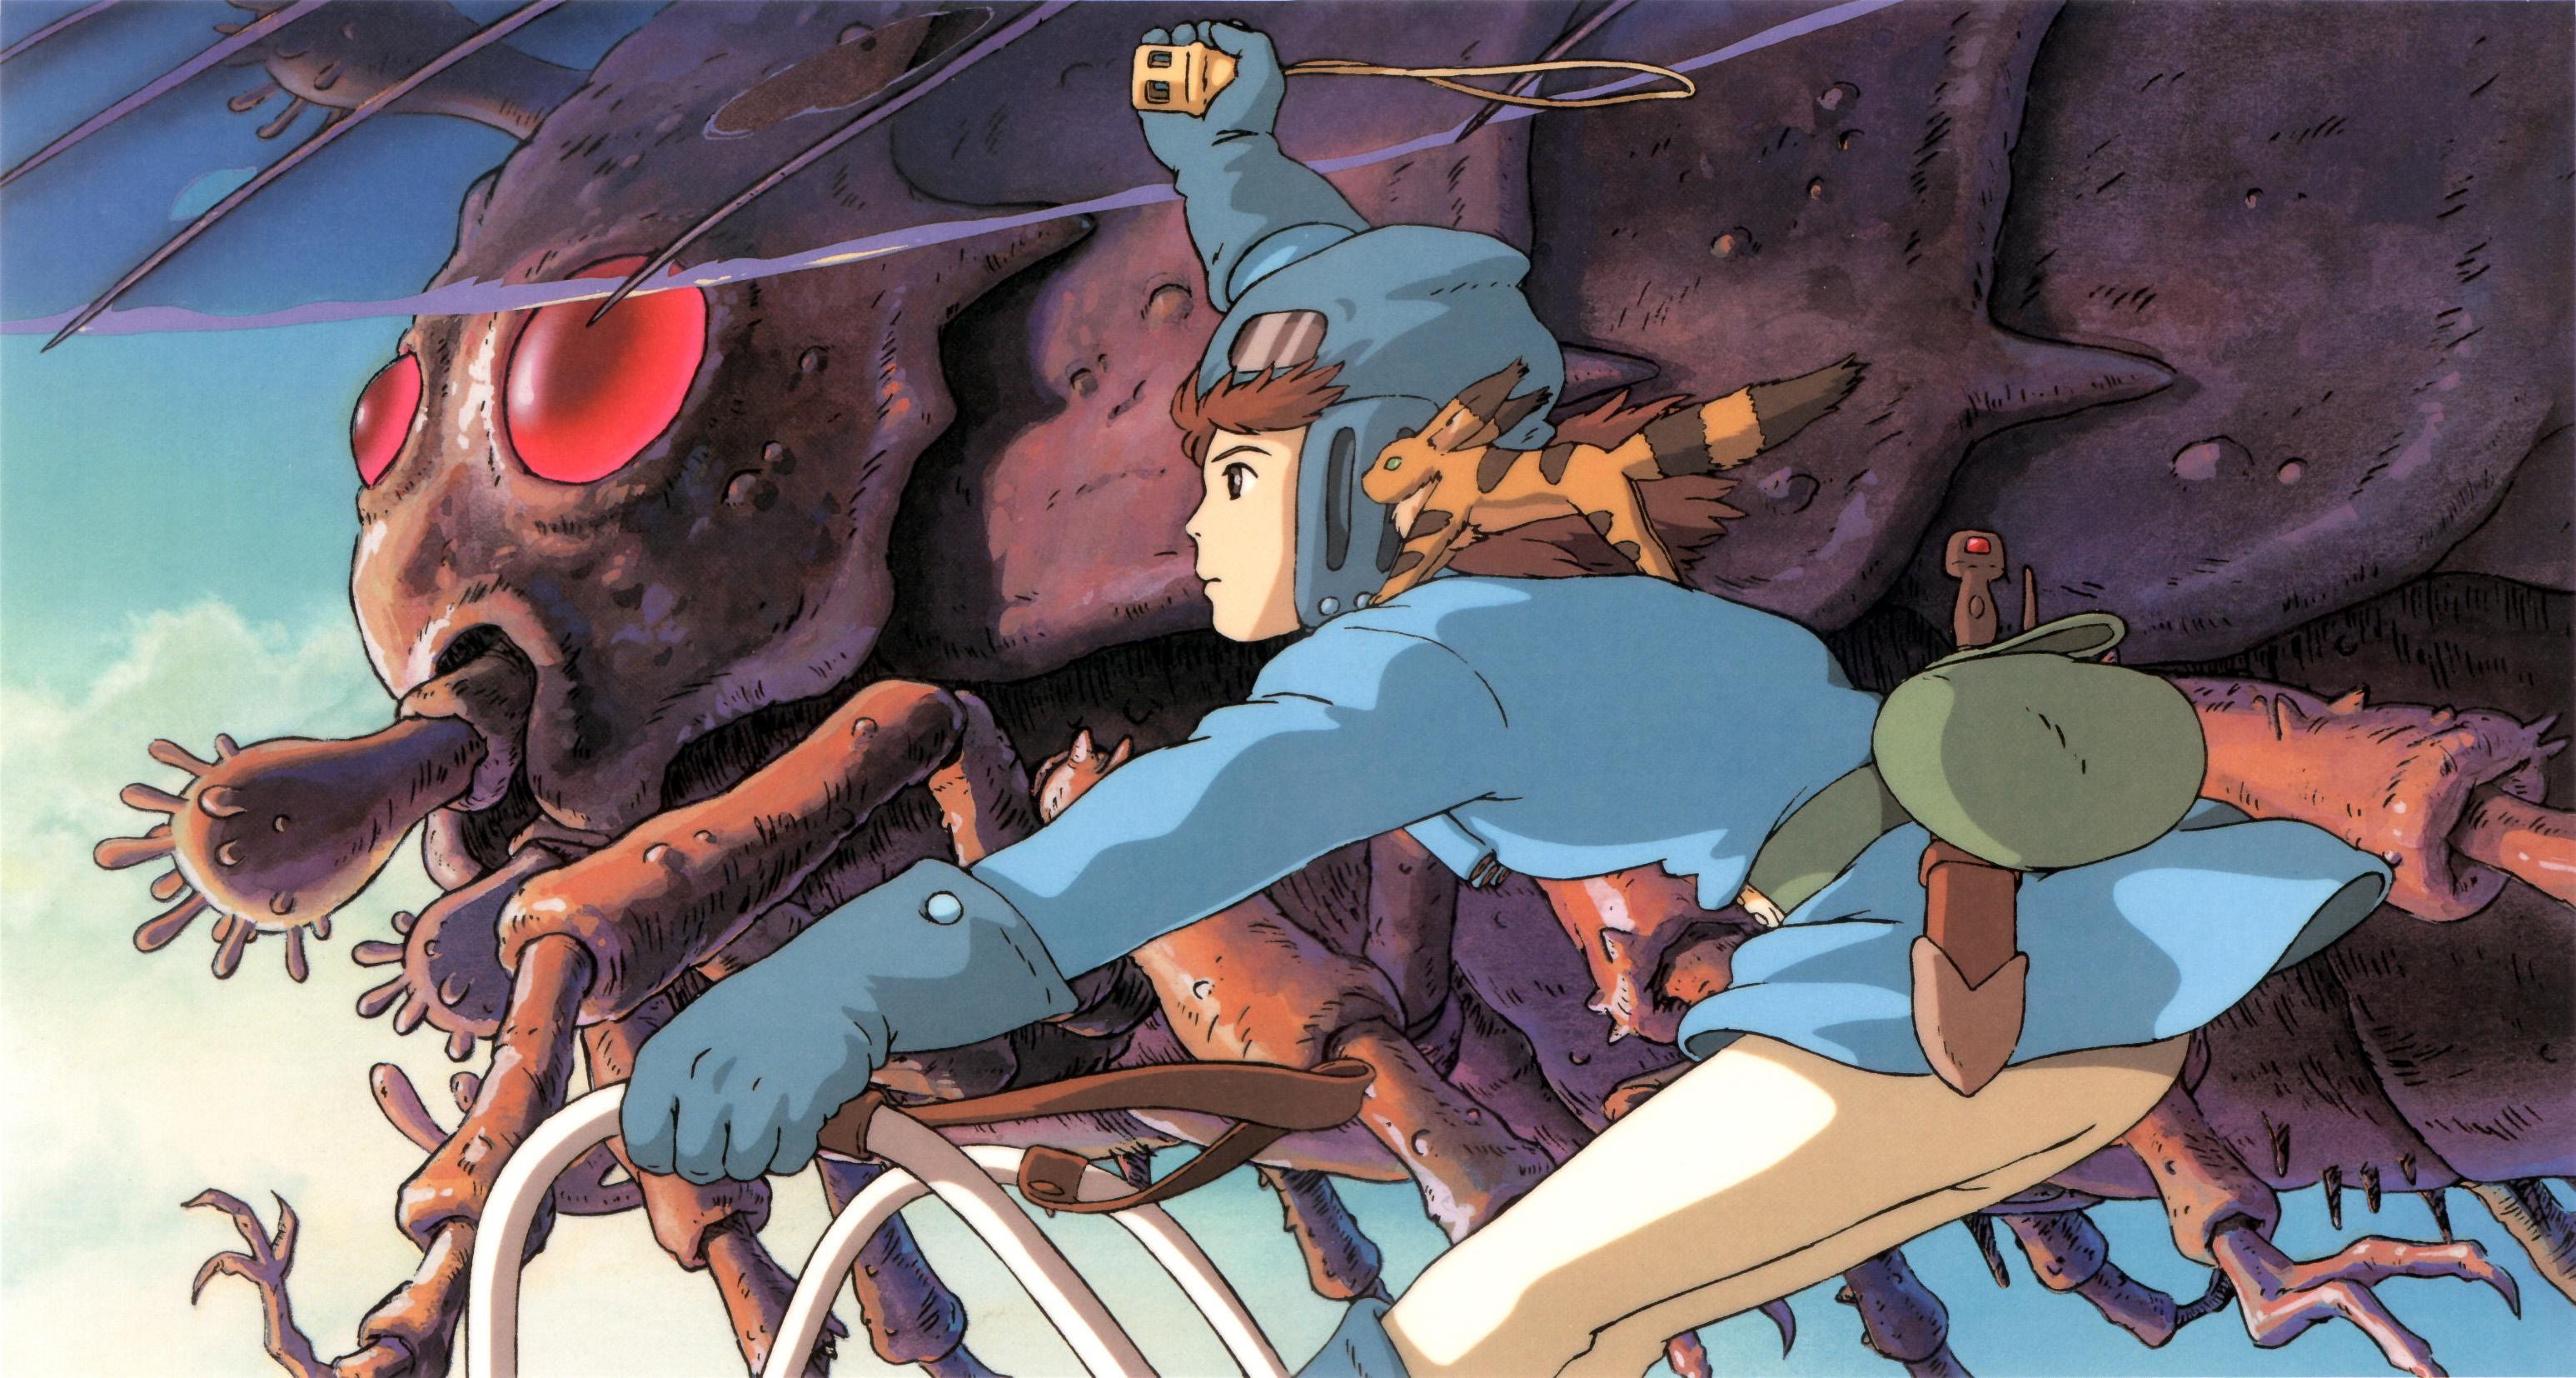 Watch: A Feminist Guide to the Kick-Ass Women of Studio Ghibli